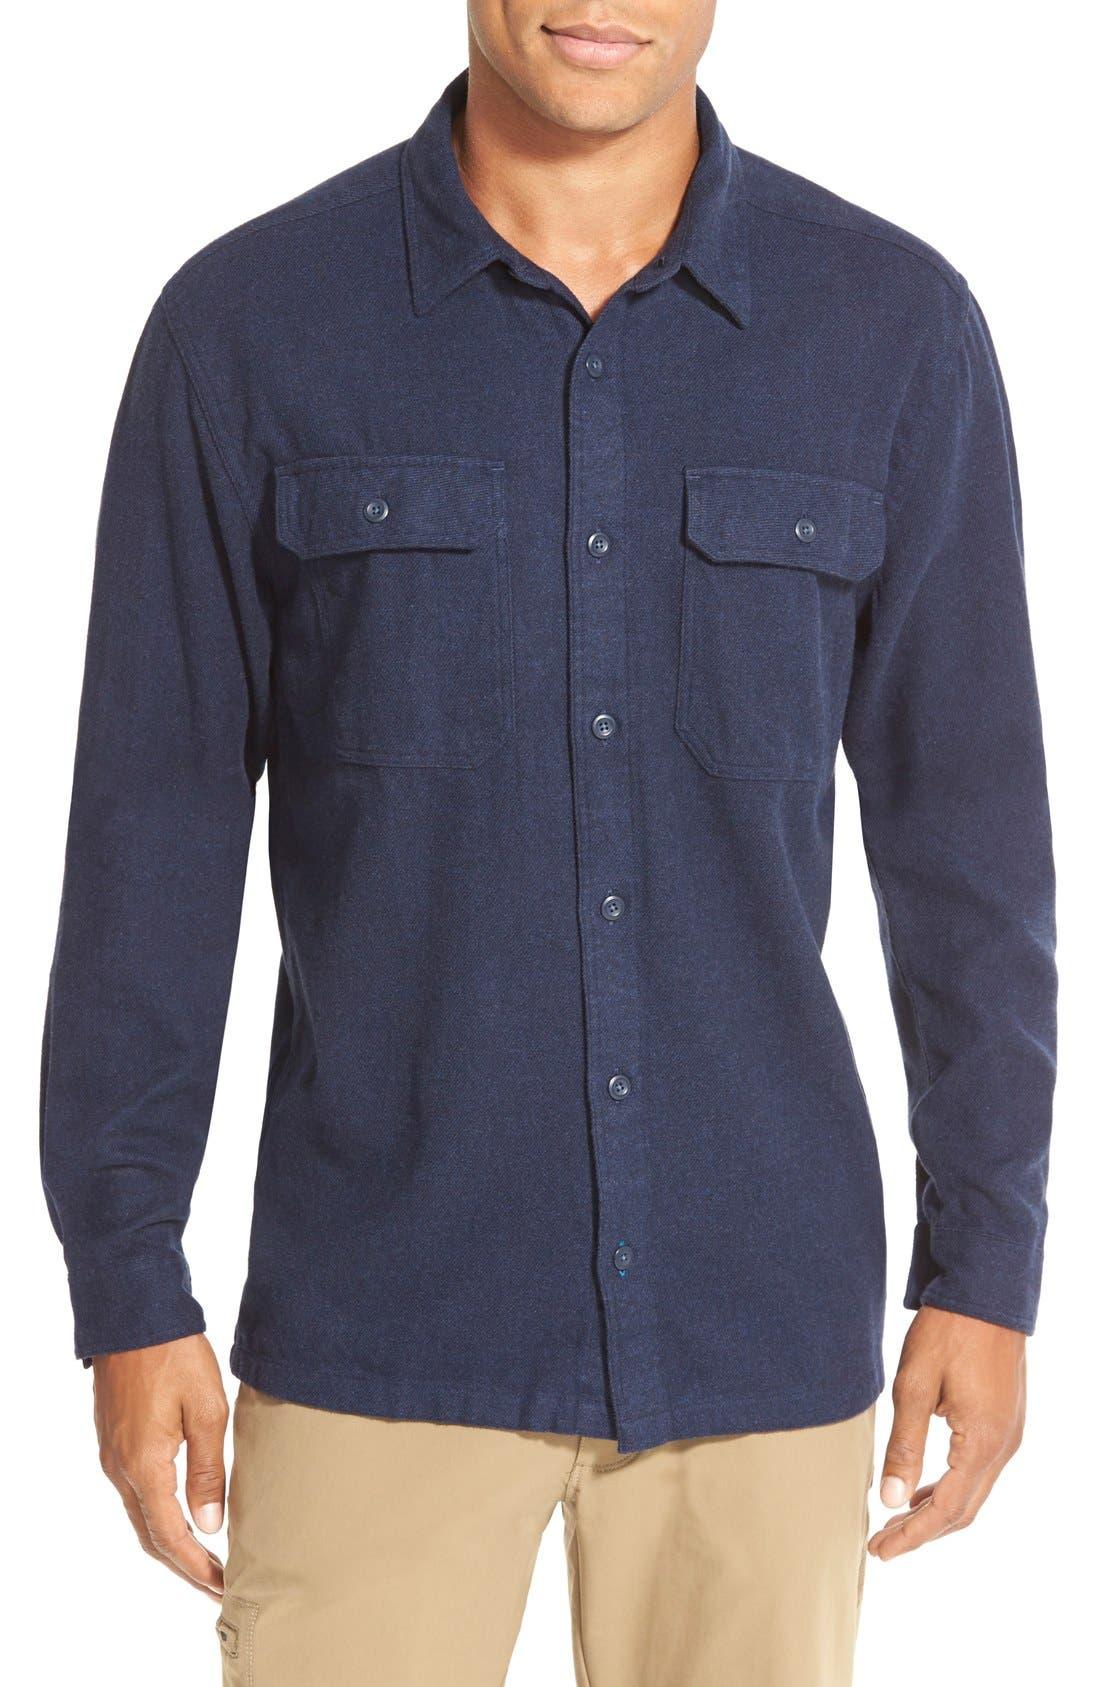 'Fjord' Regular Fit Organic Cotton Flannel Shirt,                         Main,                         color, Migration Plaid: Andes Blue